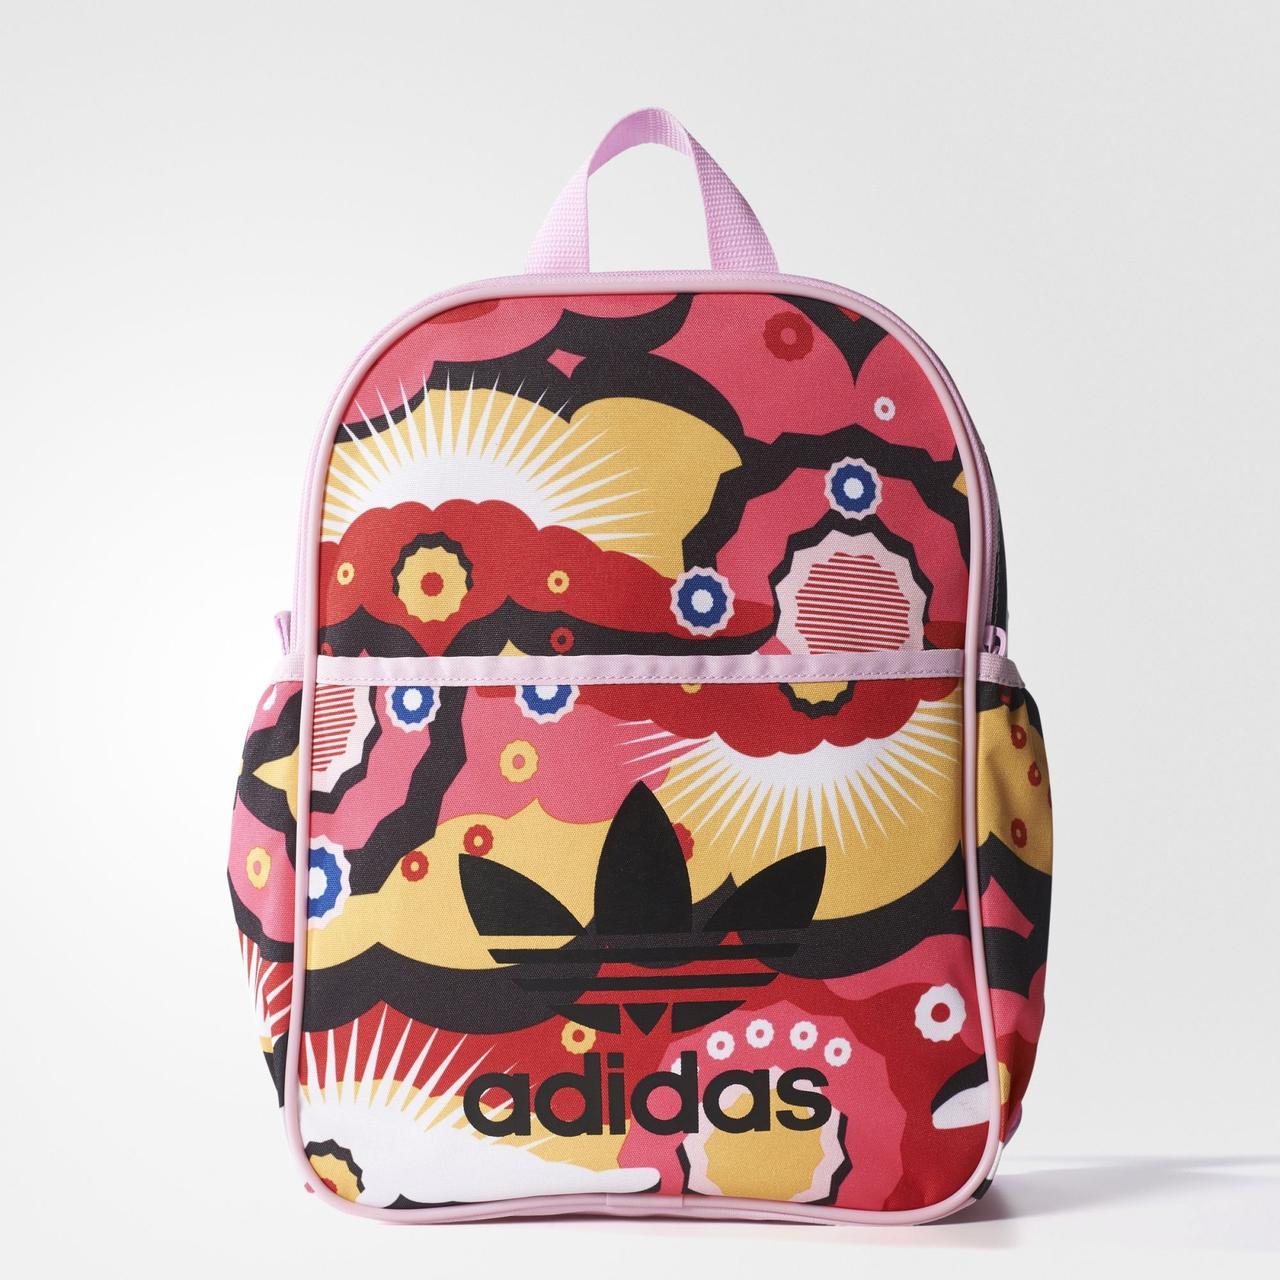 34239a0a Детский рюкзак Adidas Originals Clouds (Артикул: BR4881) - Интернет-магазин  «Эксперт